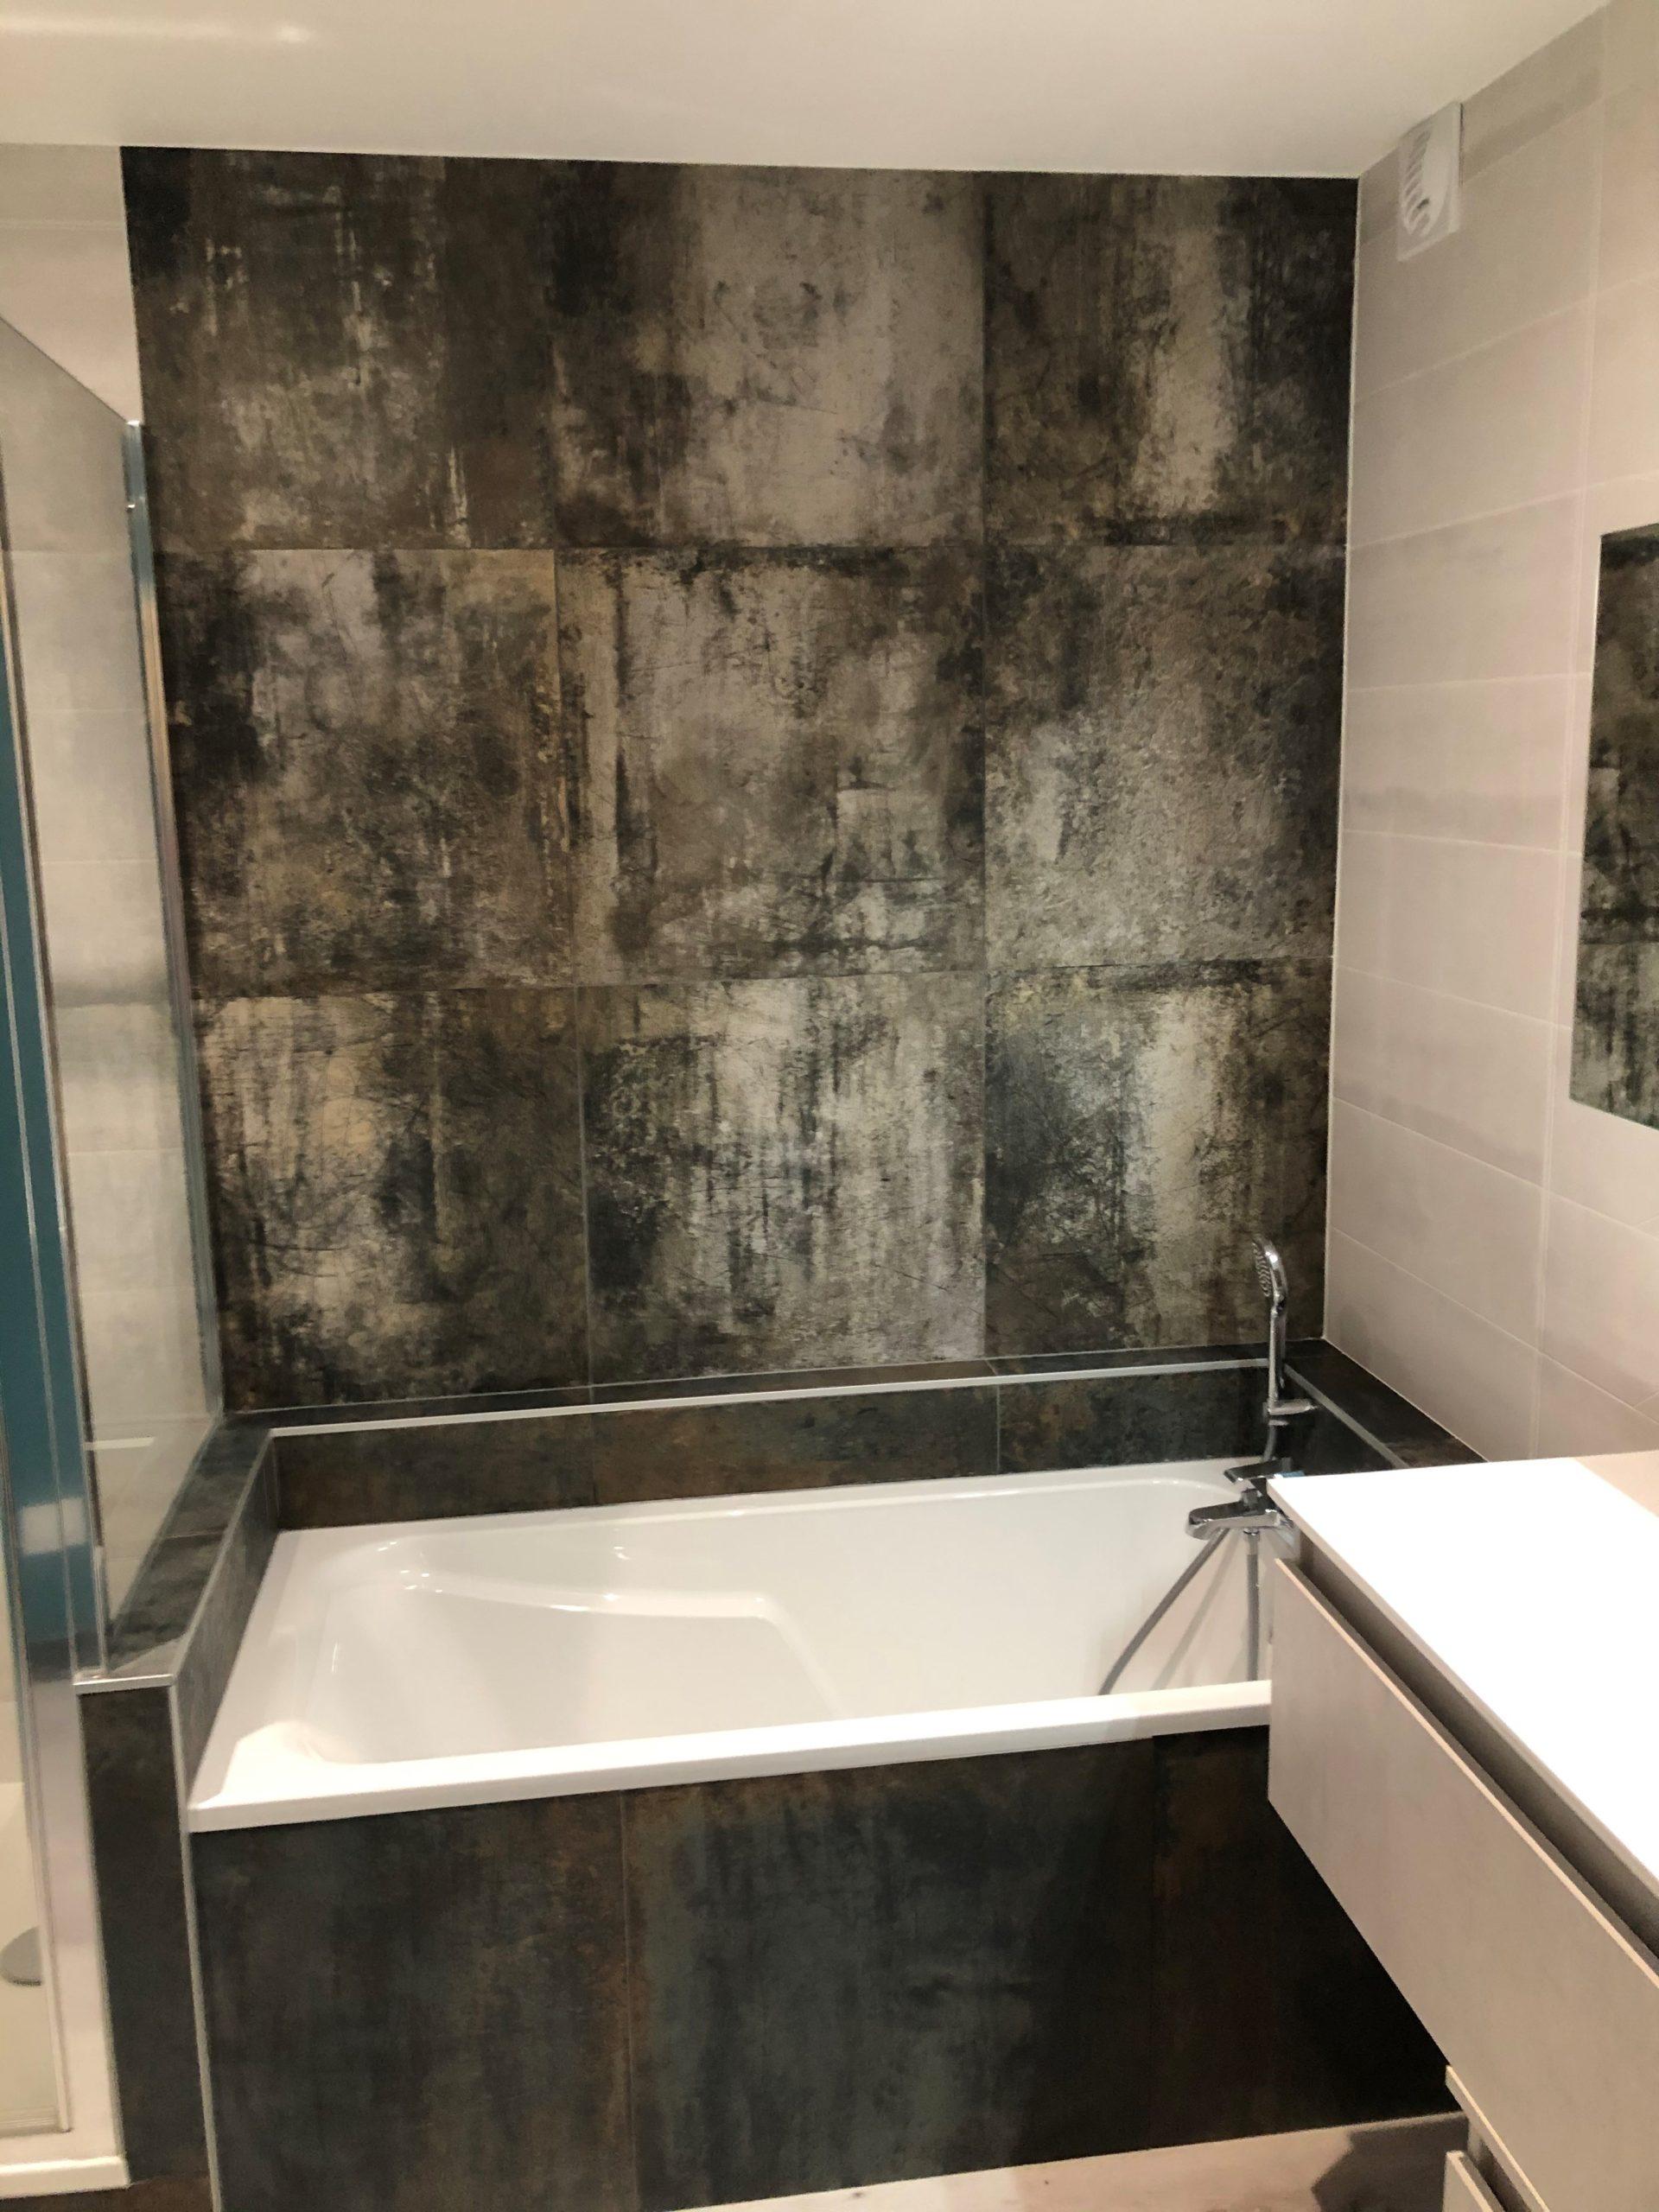 projet salle bain originale coloree baignoire faience apres cavaroz